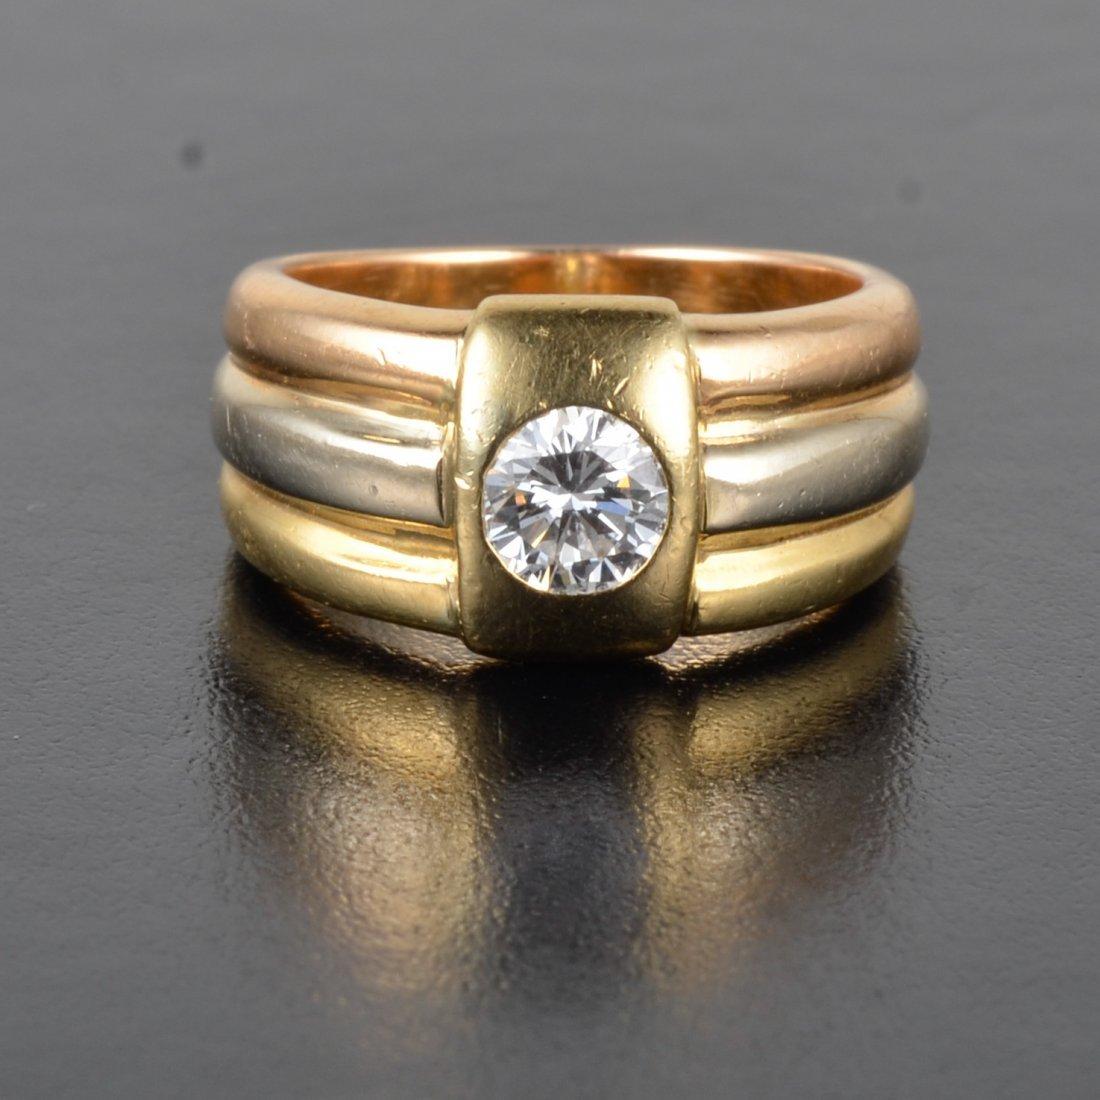 Cartier three color gold diamond ring